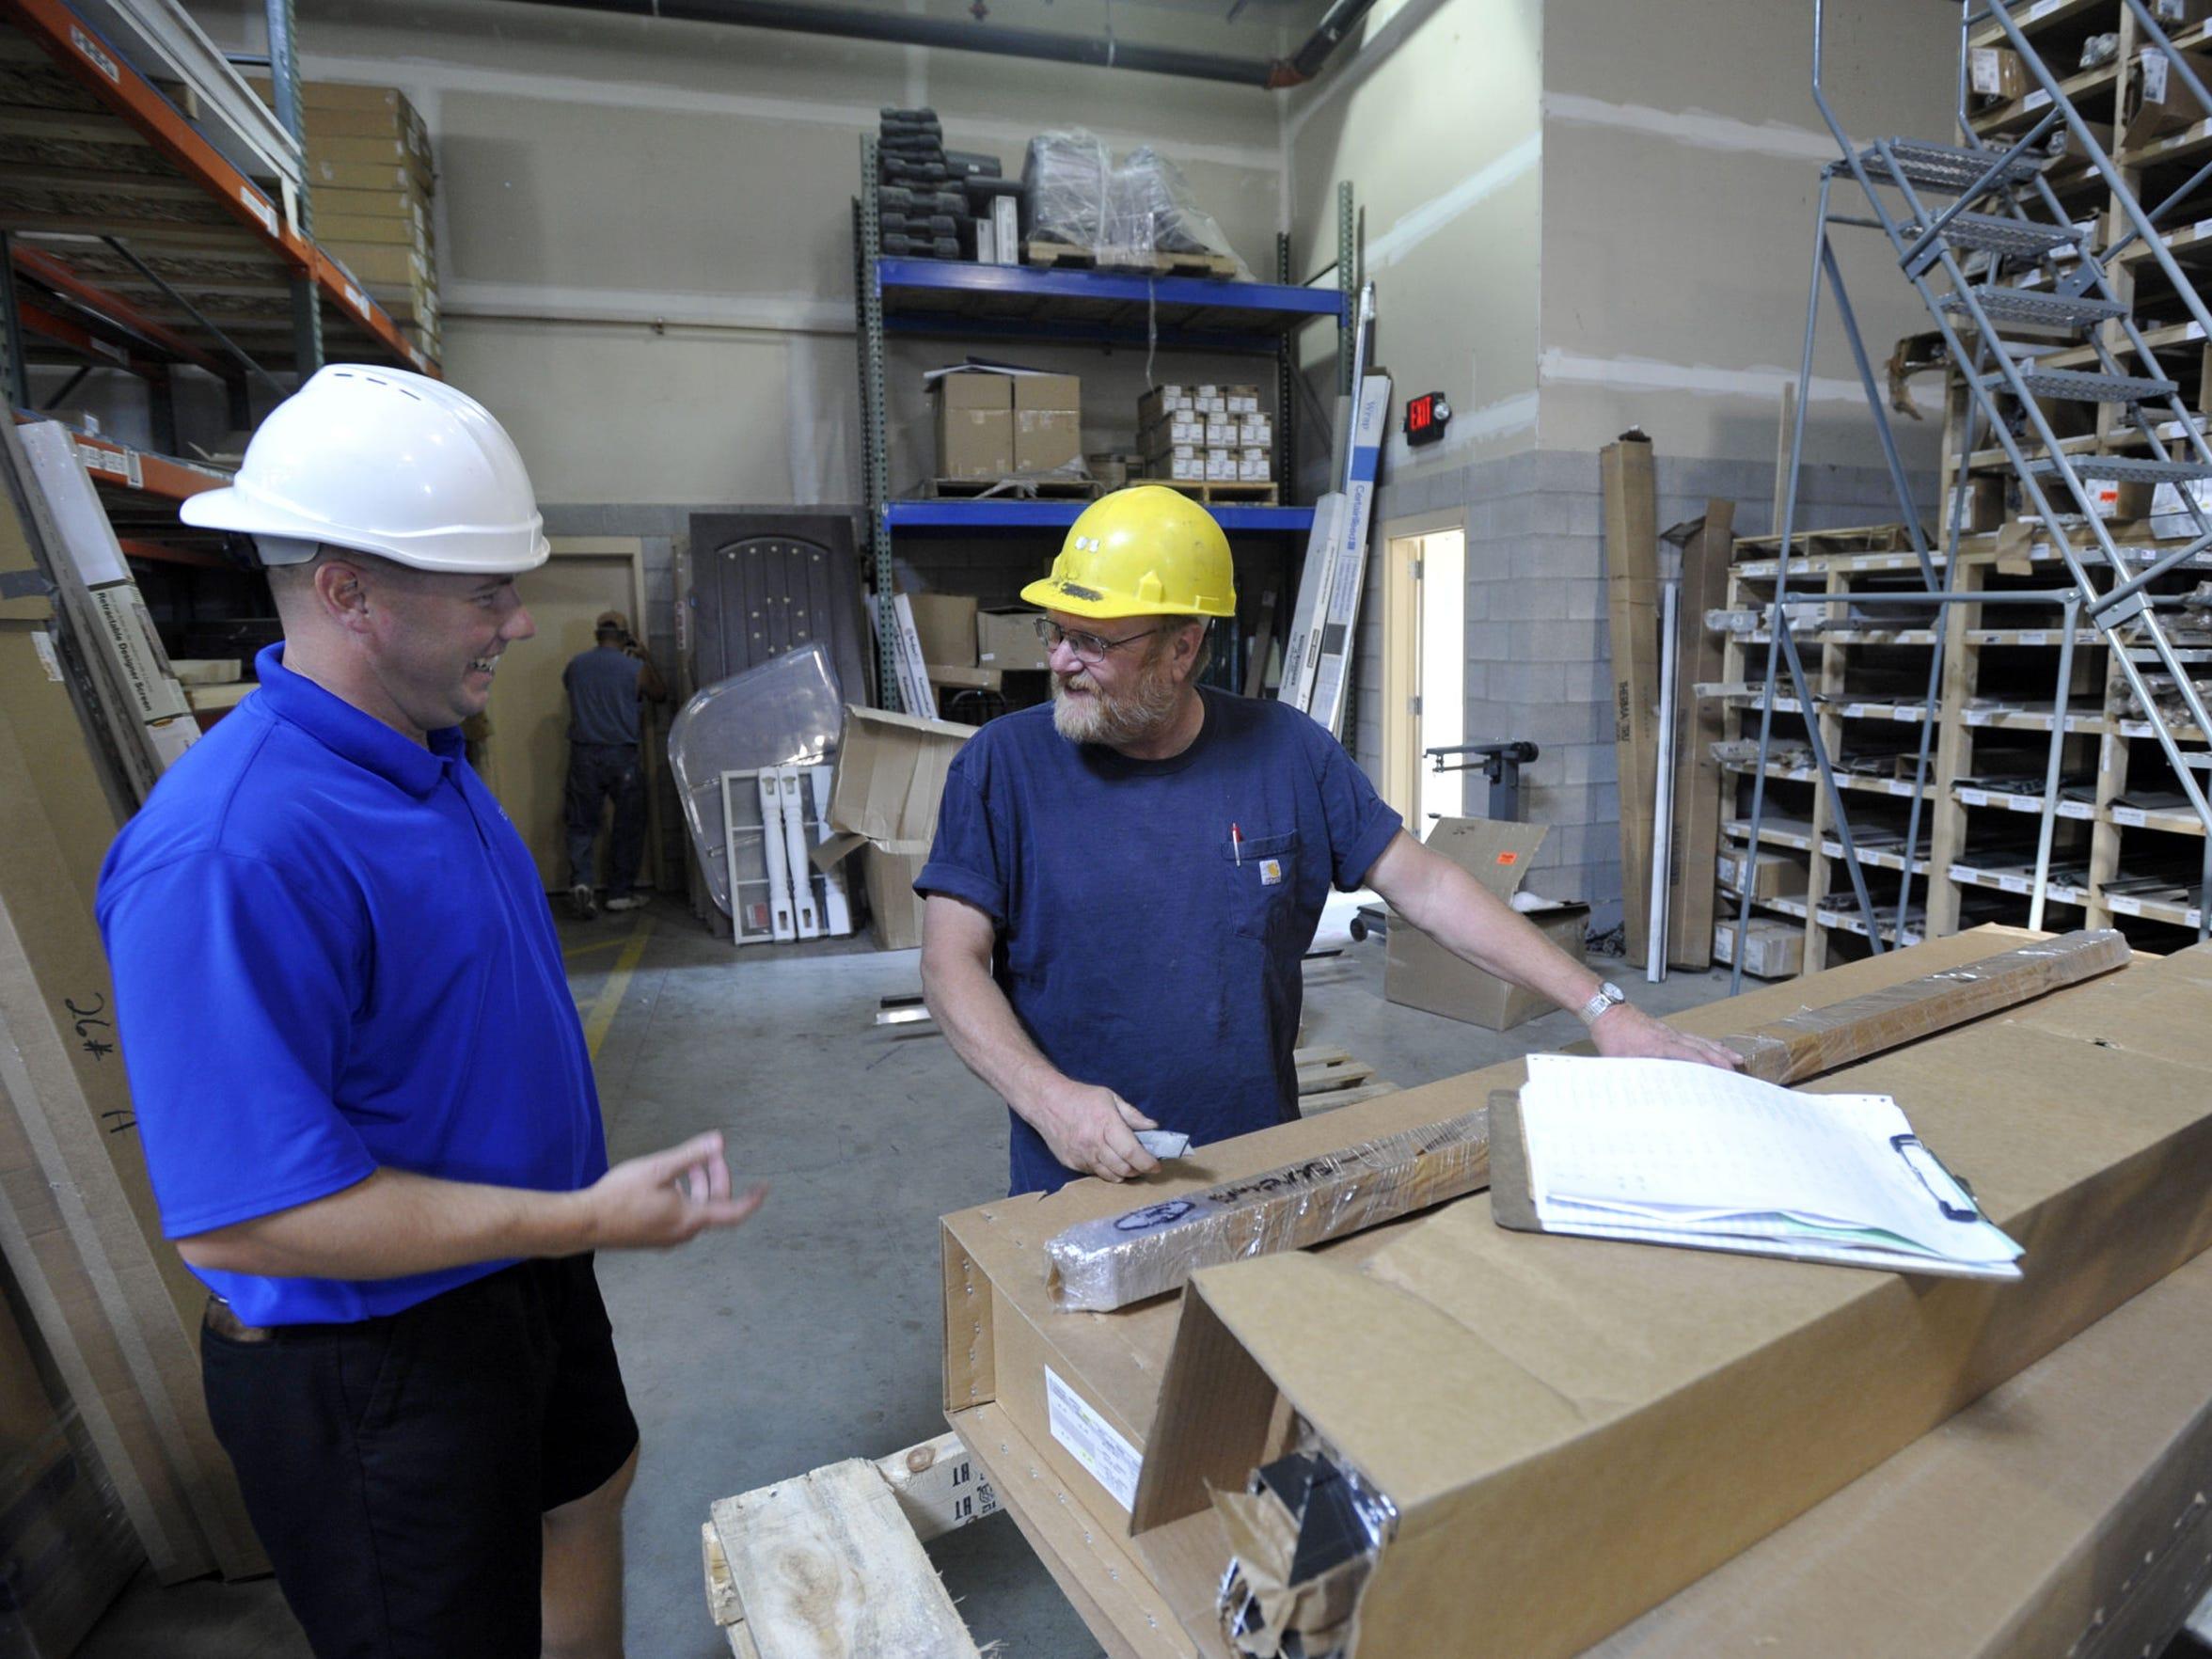 Jason Bake, left, talks with warehousemen Randy Little